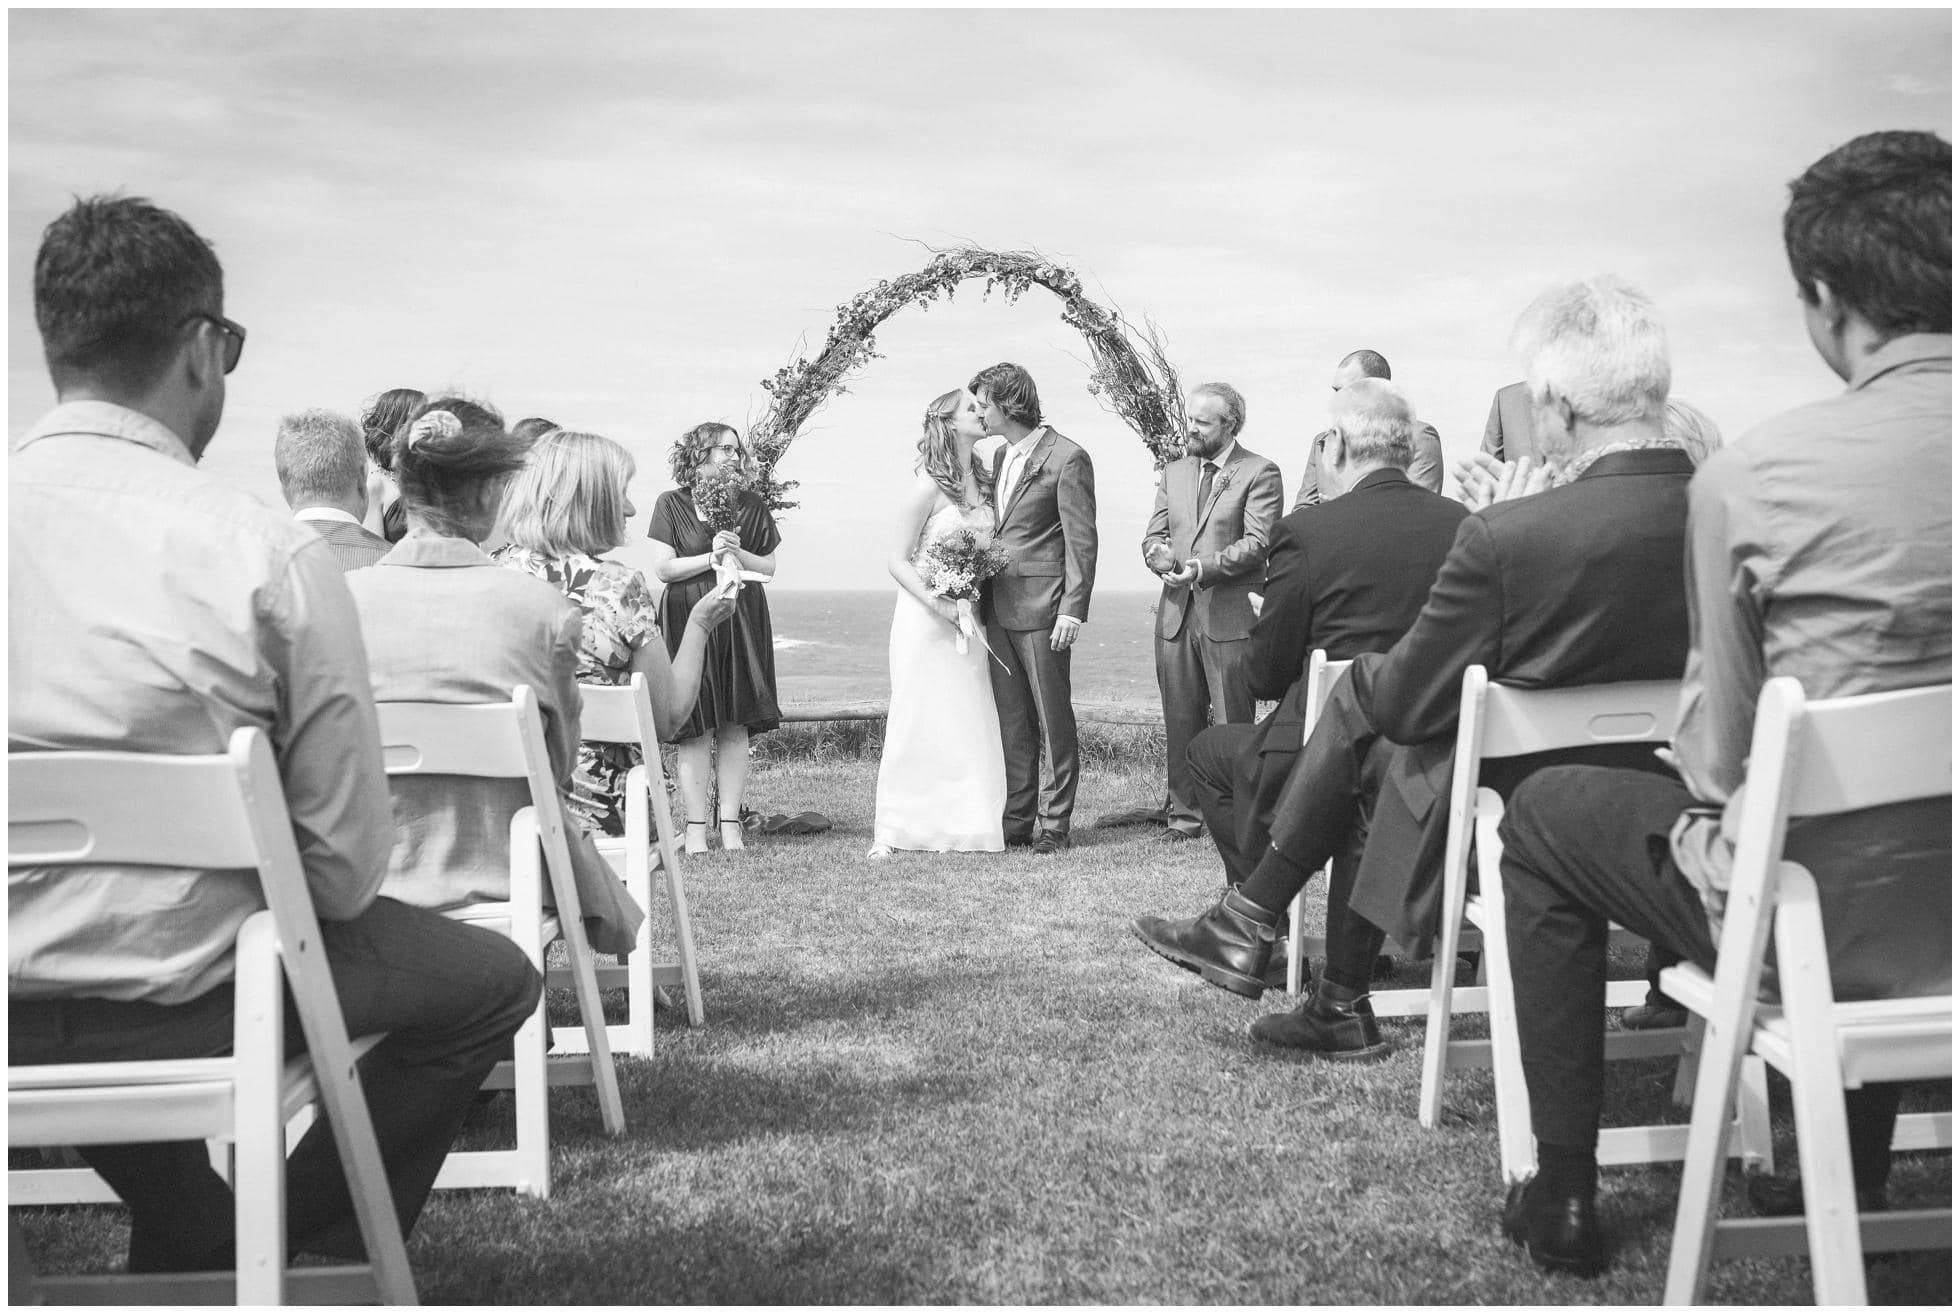 The bride and groom kiss at a wedding at the Robert Dun reserve